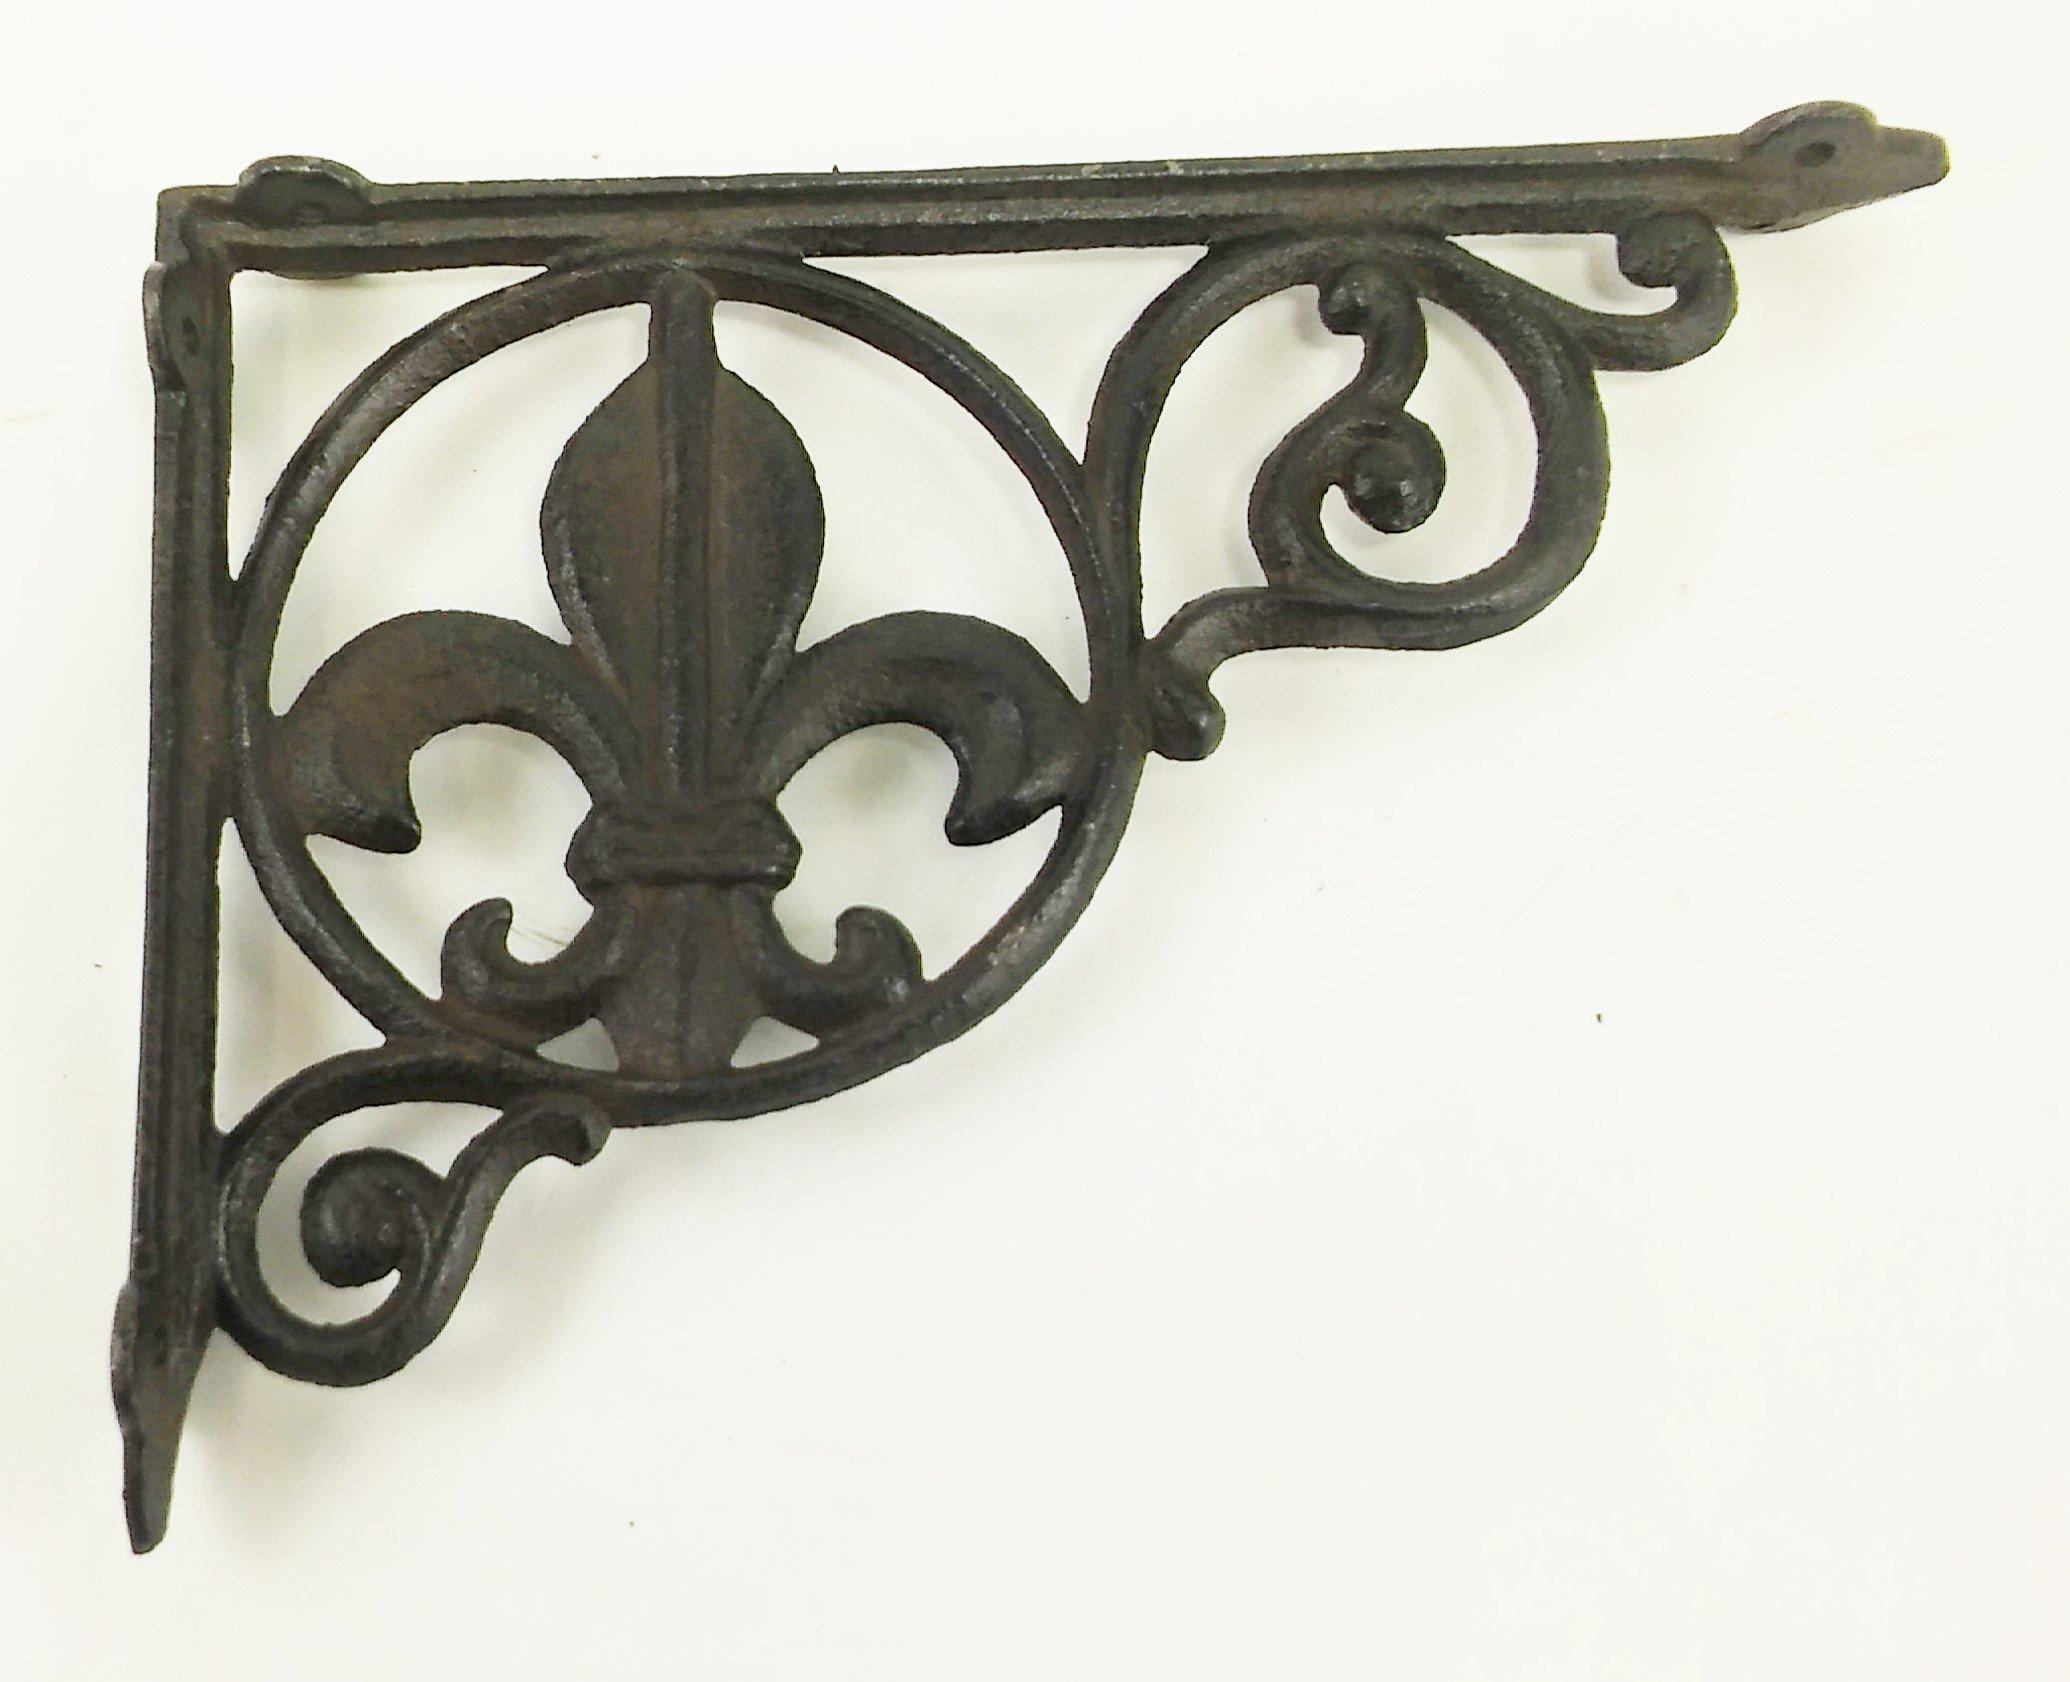 Aunt Chris' Products - Heavy Cast Iron - All-Purpose - Fluer-De-Lis Shelf Bracket - Bronze Rustic Color Finish - Nautical Design - Indoor or Outdoor Use